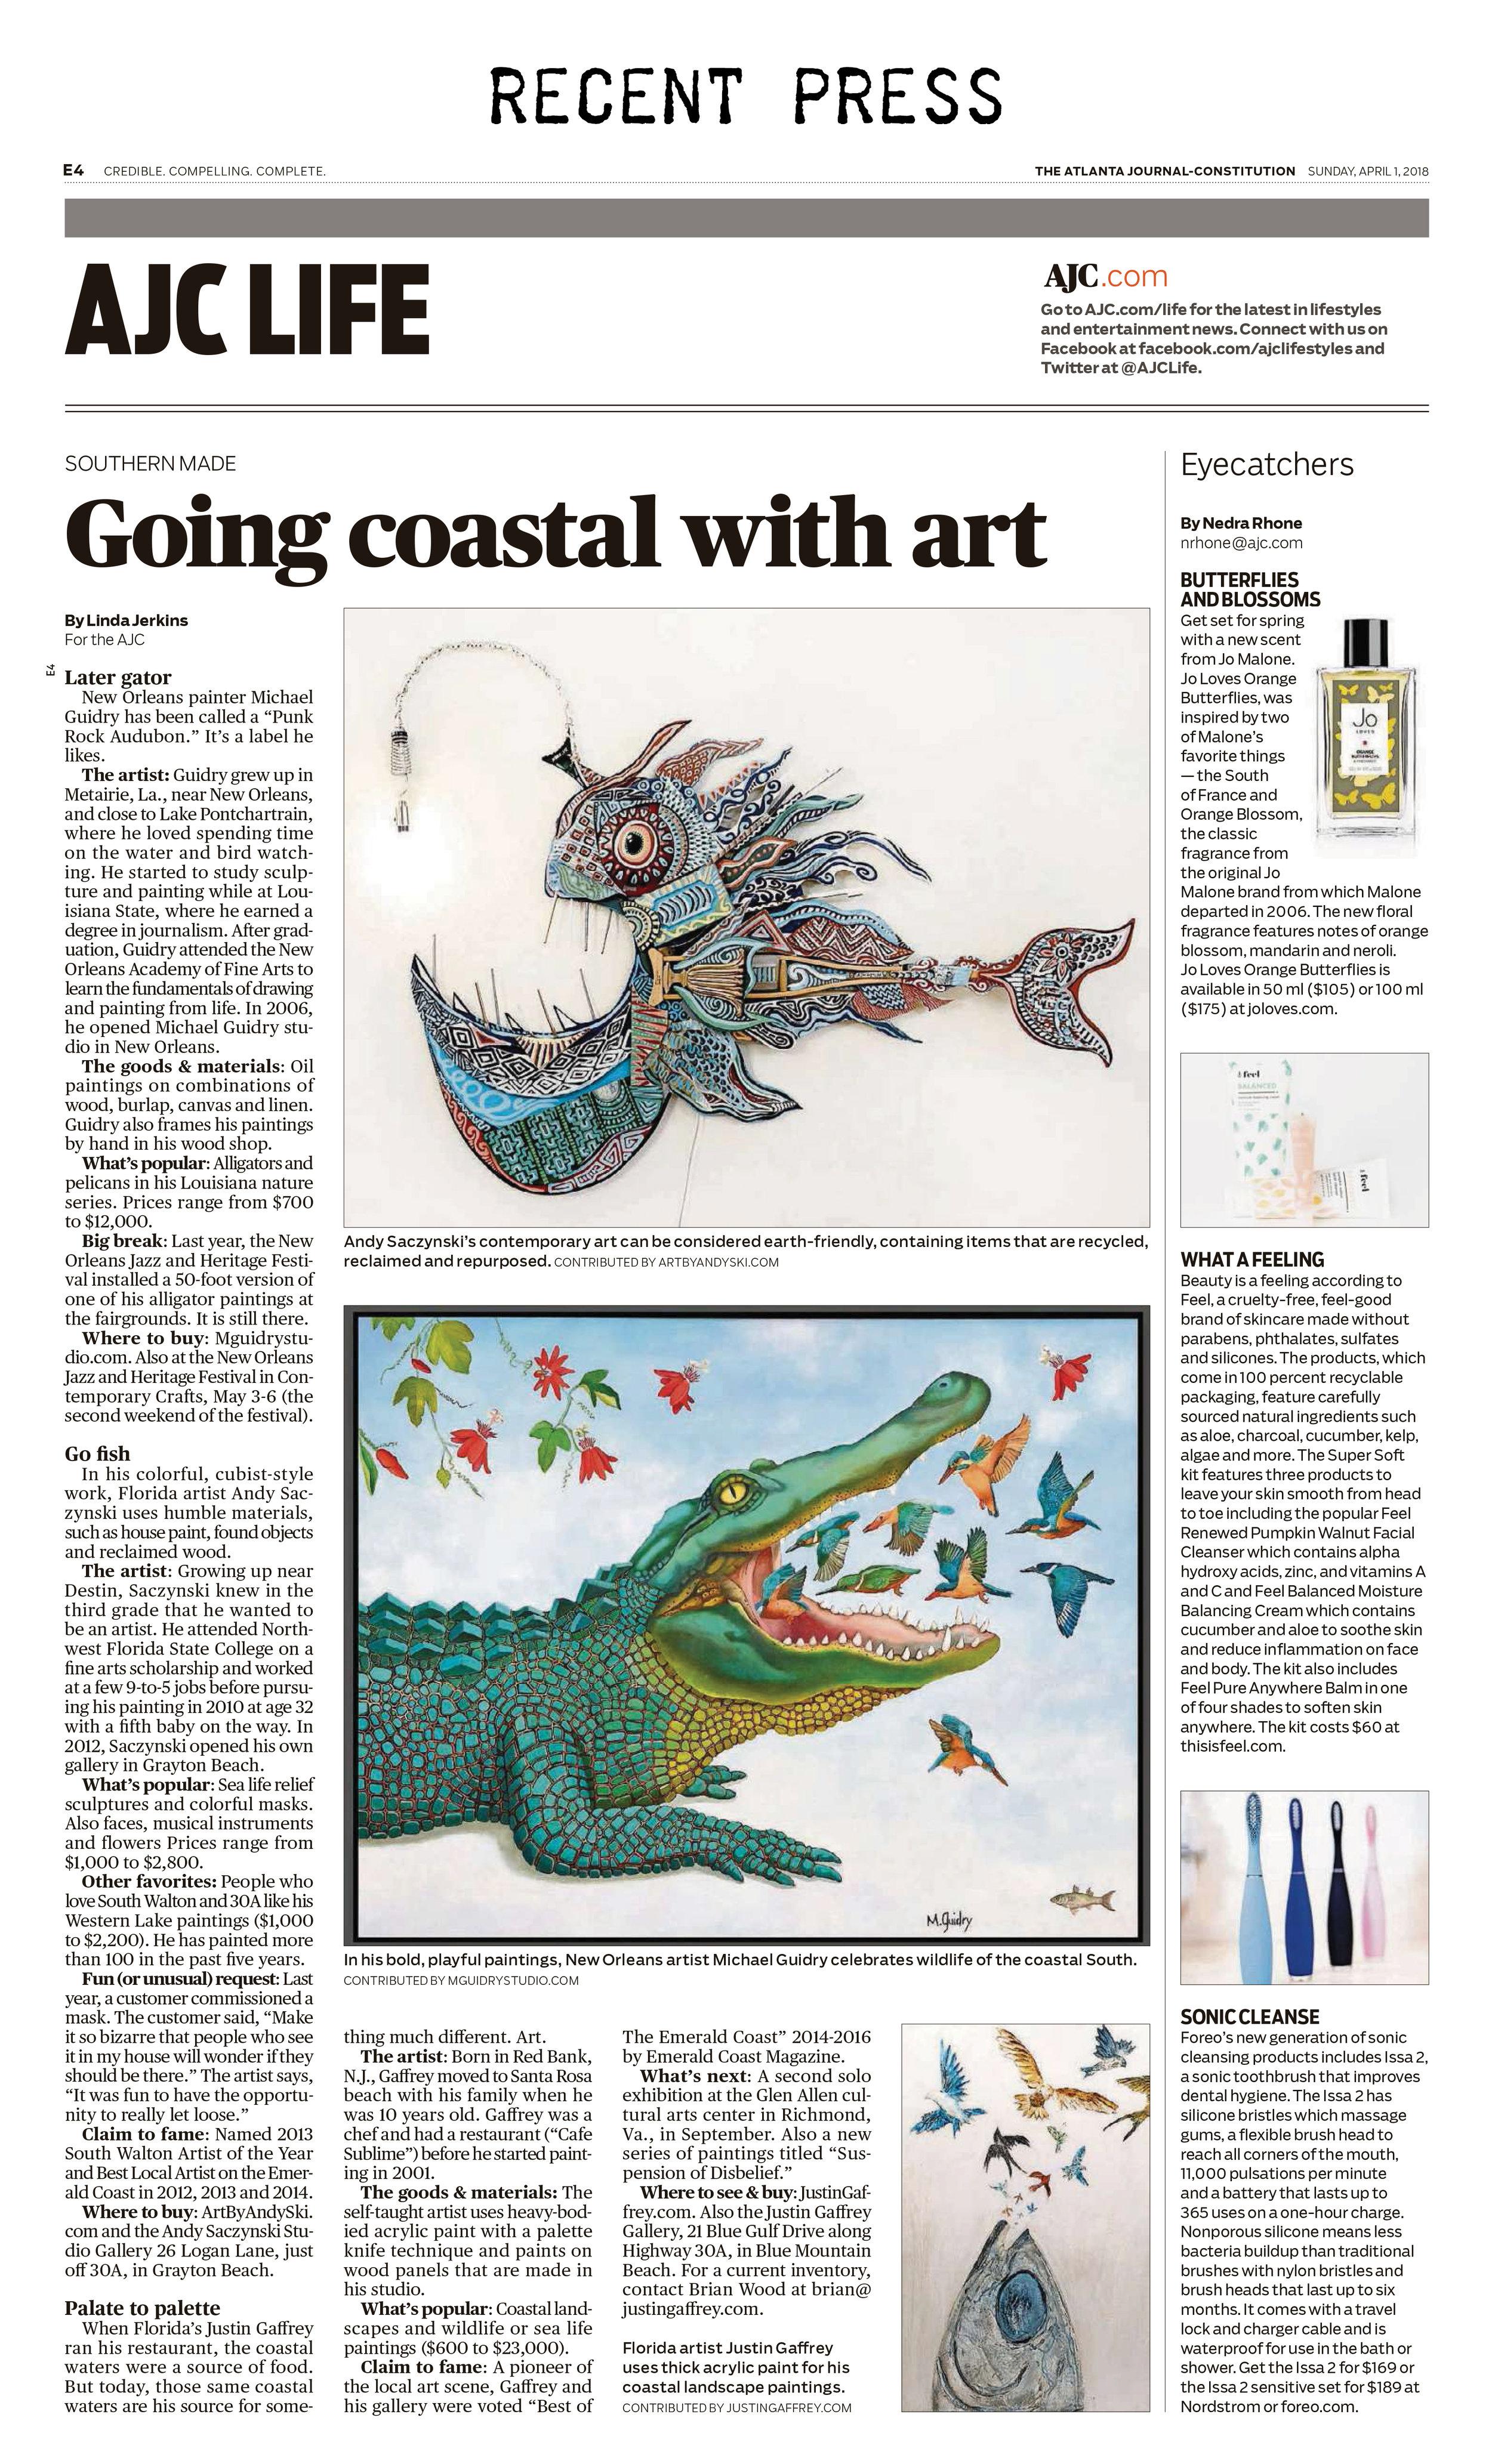 atlanta-journal-constitution-recent-press--m-michael-guidry-neworleans-louisiana-artist-studio-painter-alligator-interview-article.jpg